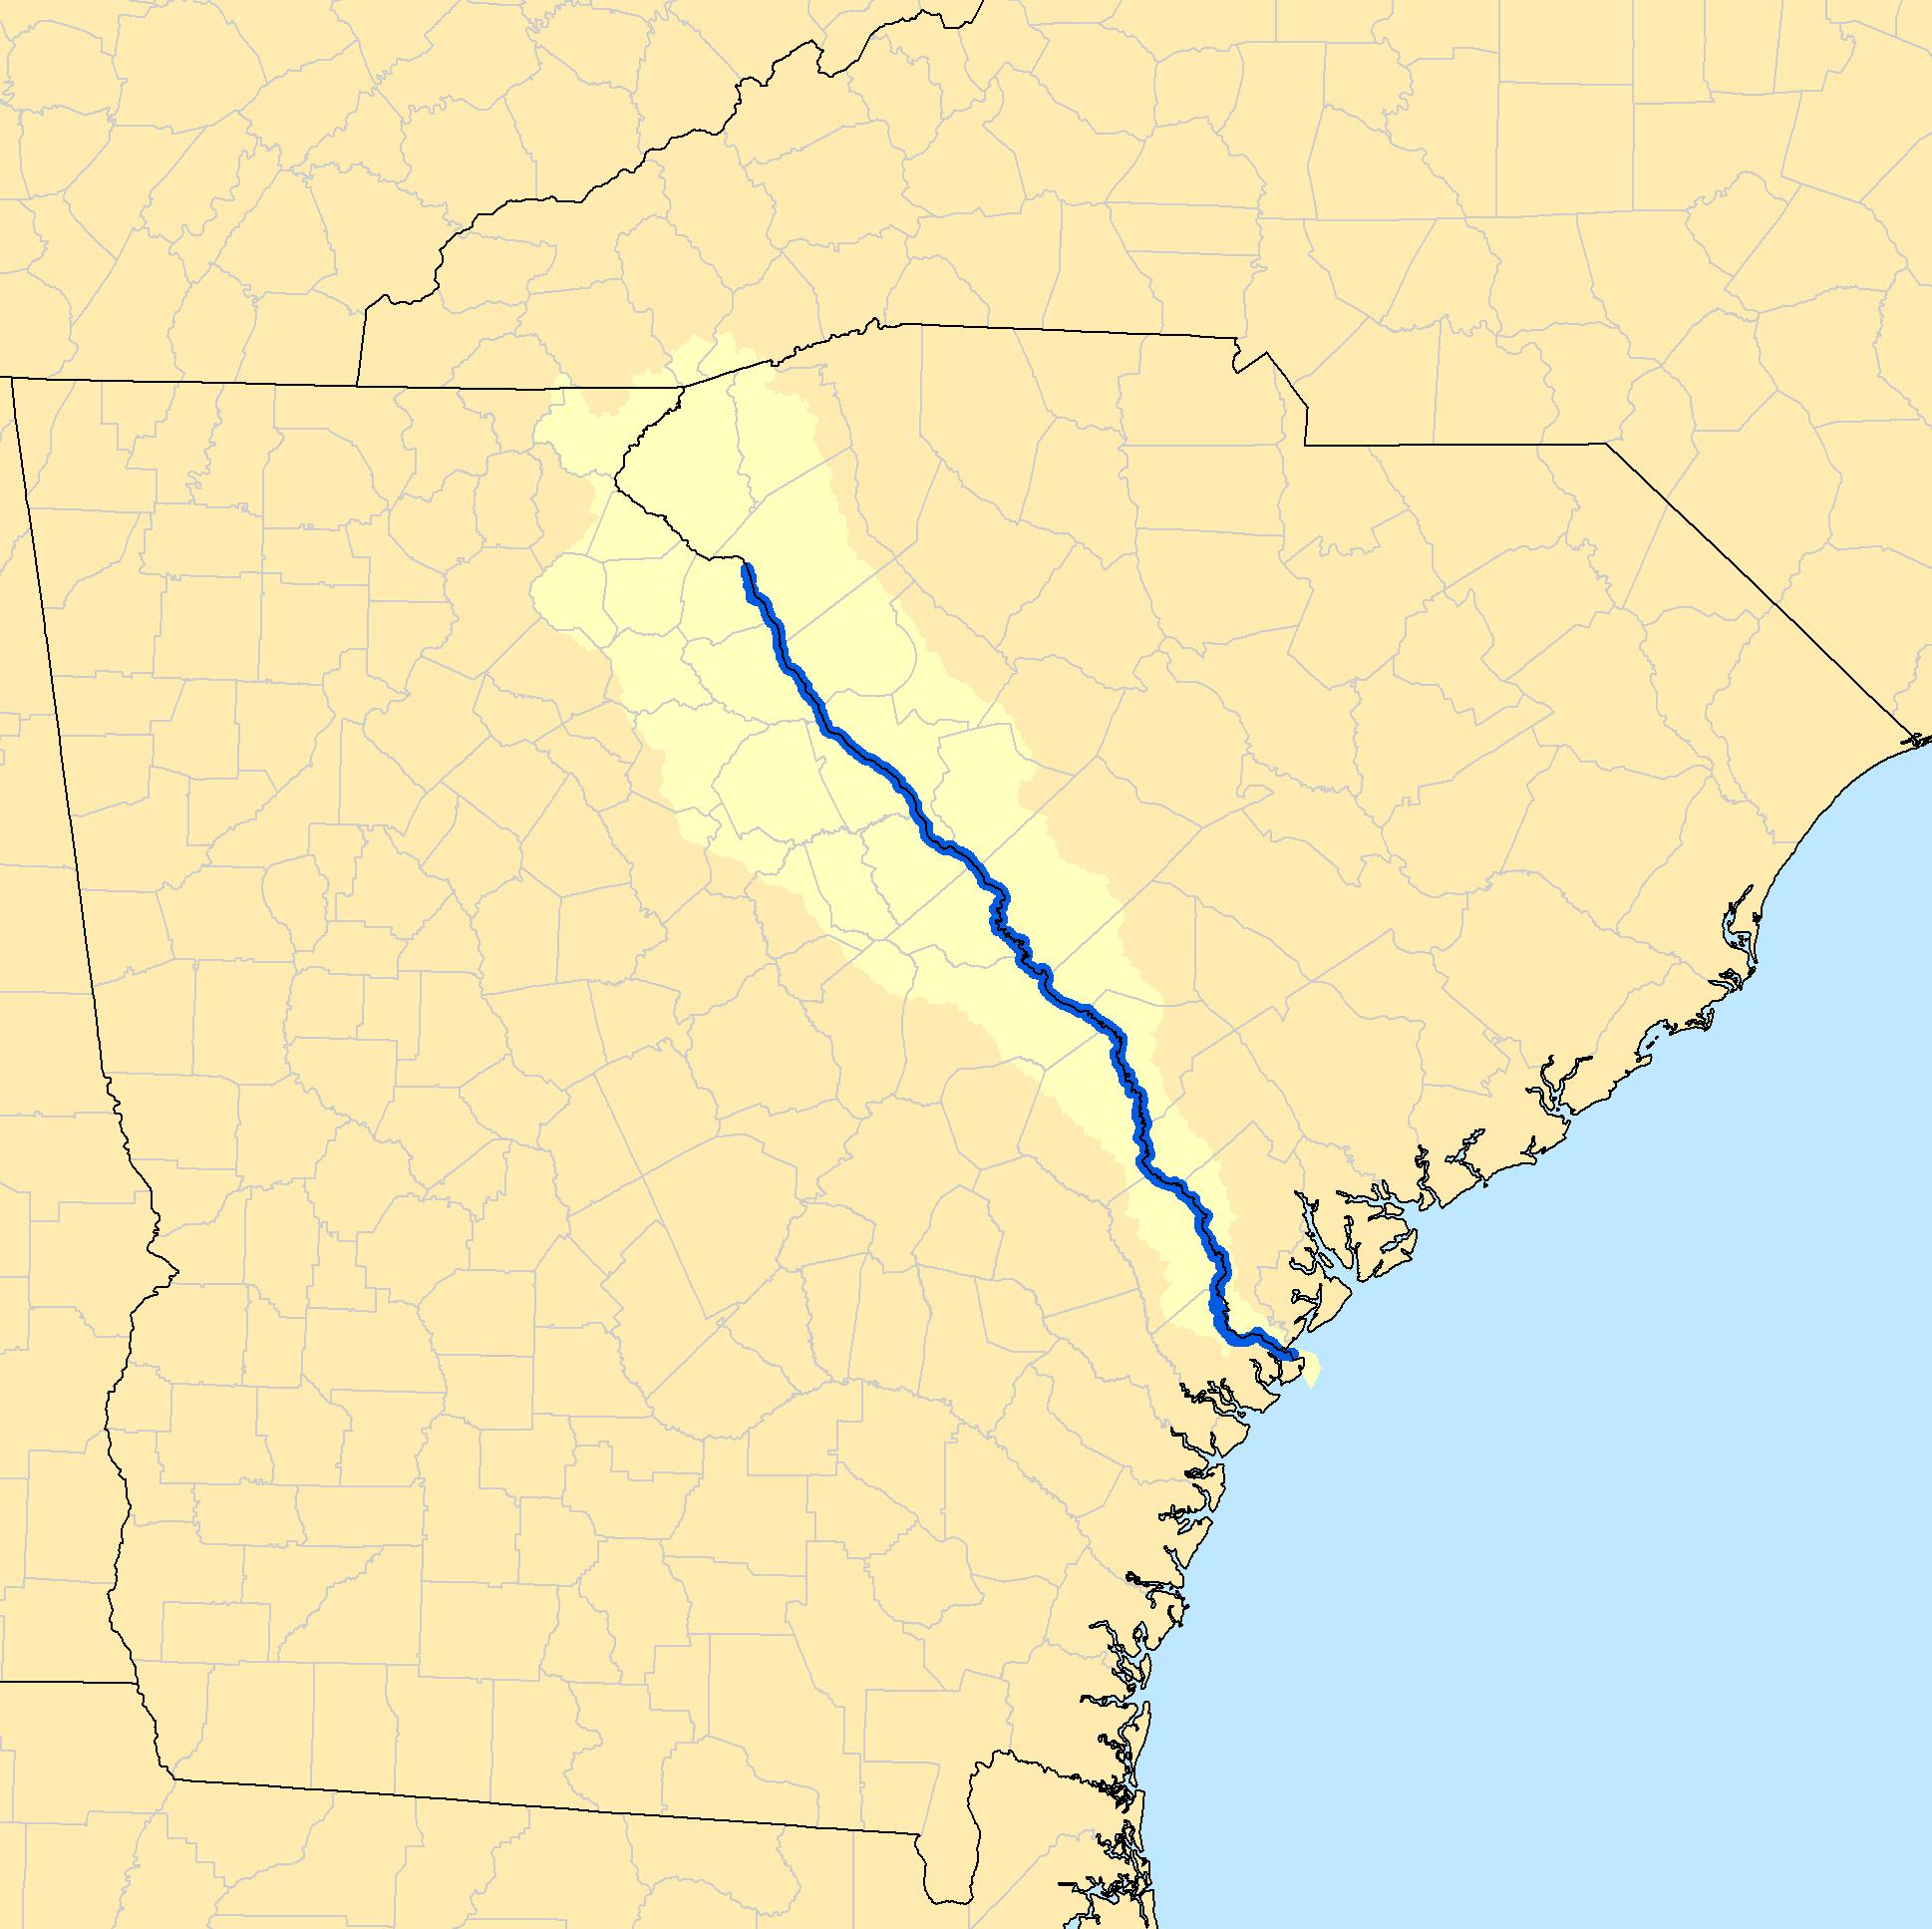 Savannah Georgia On Us Map Globalinterco - Where is georgia located on the us map